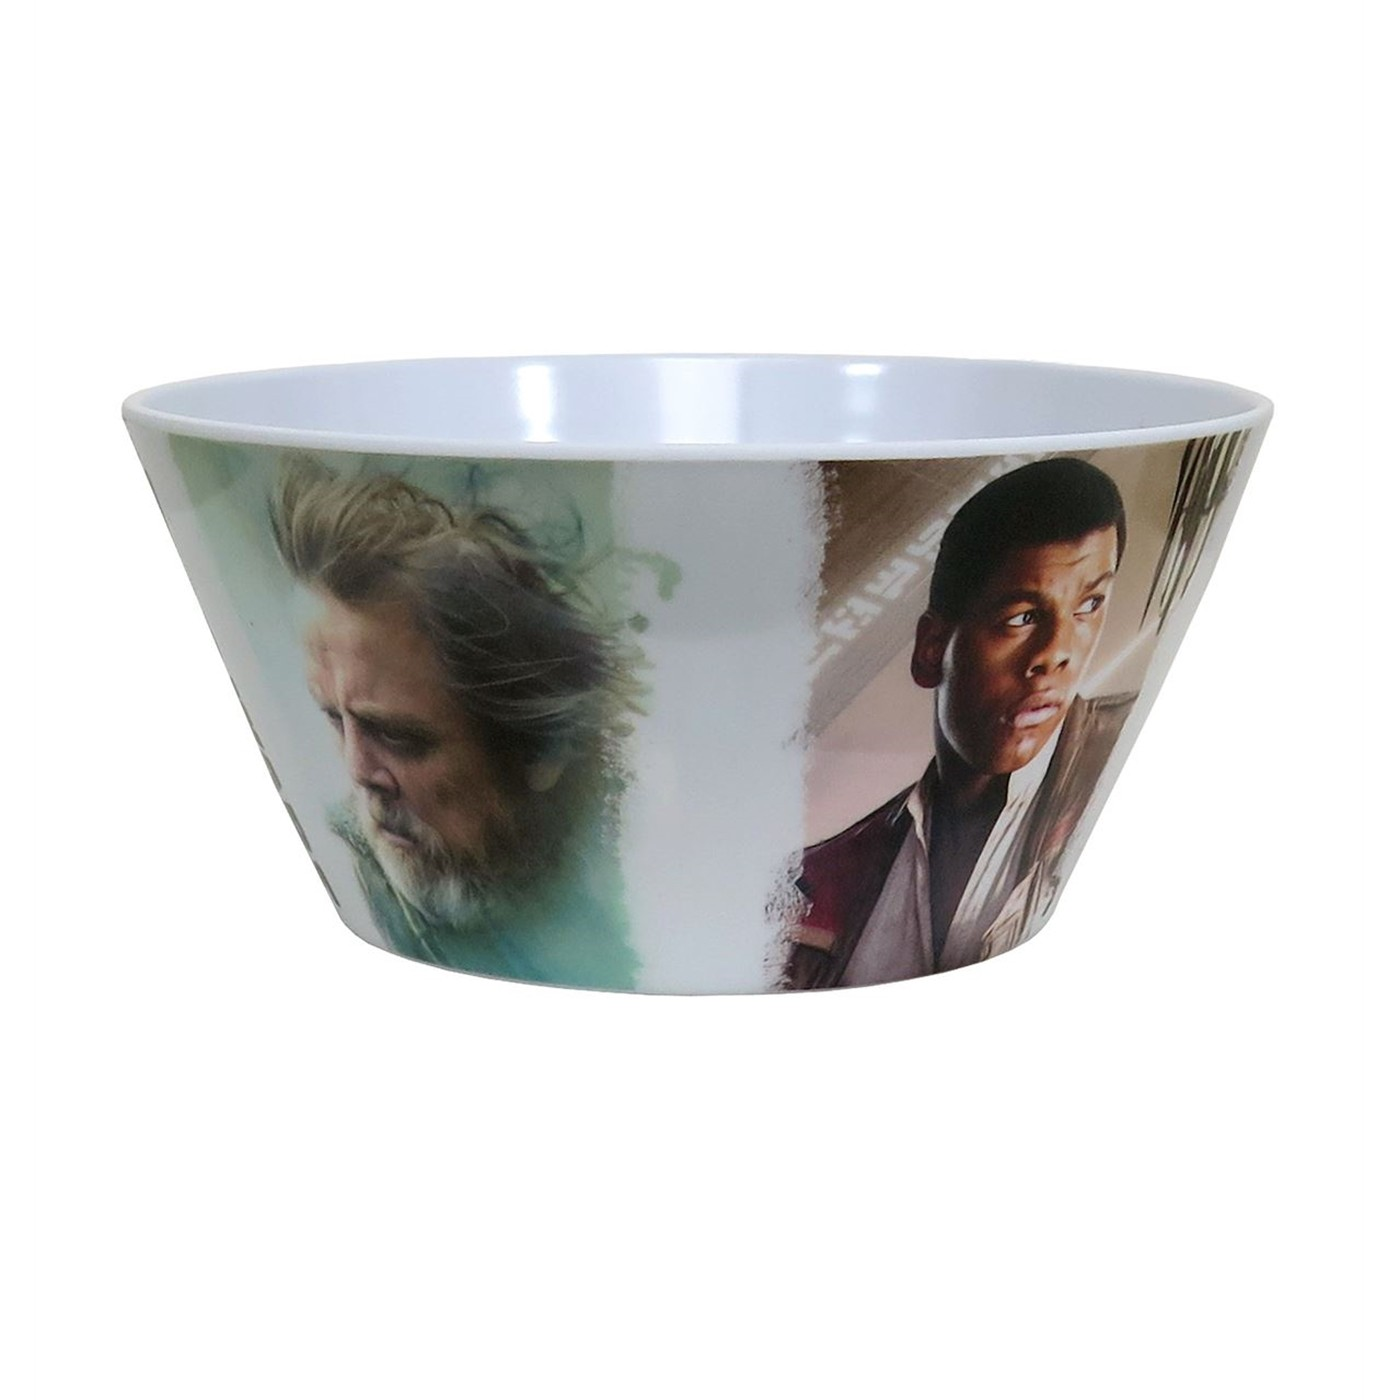 Star Wars Last Jedi 6-Inch Plastic Soup Bowl